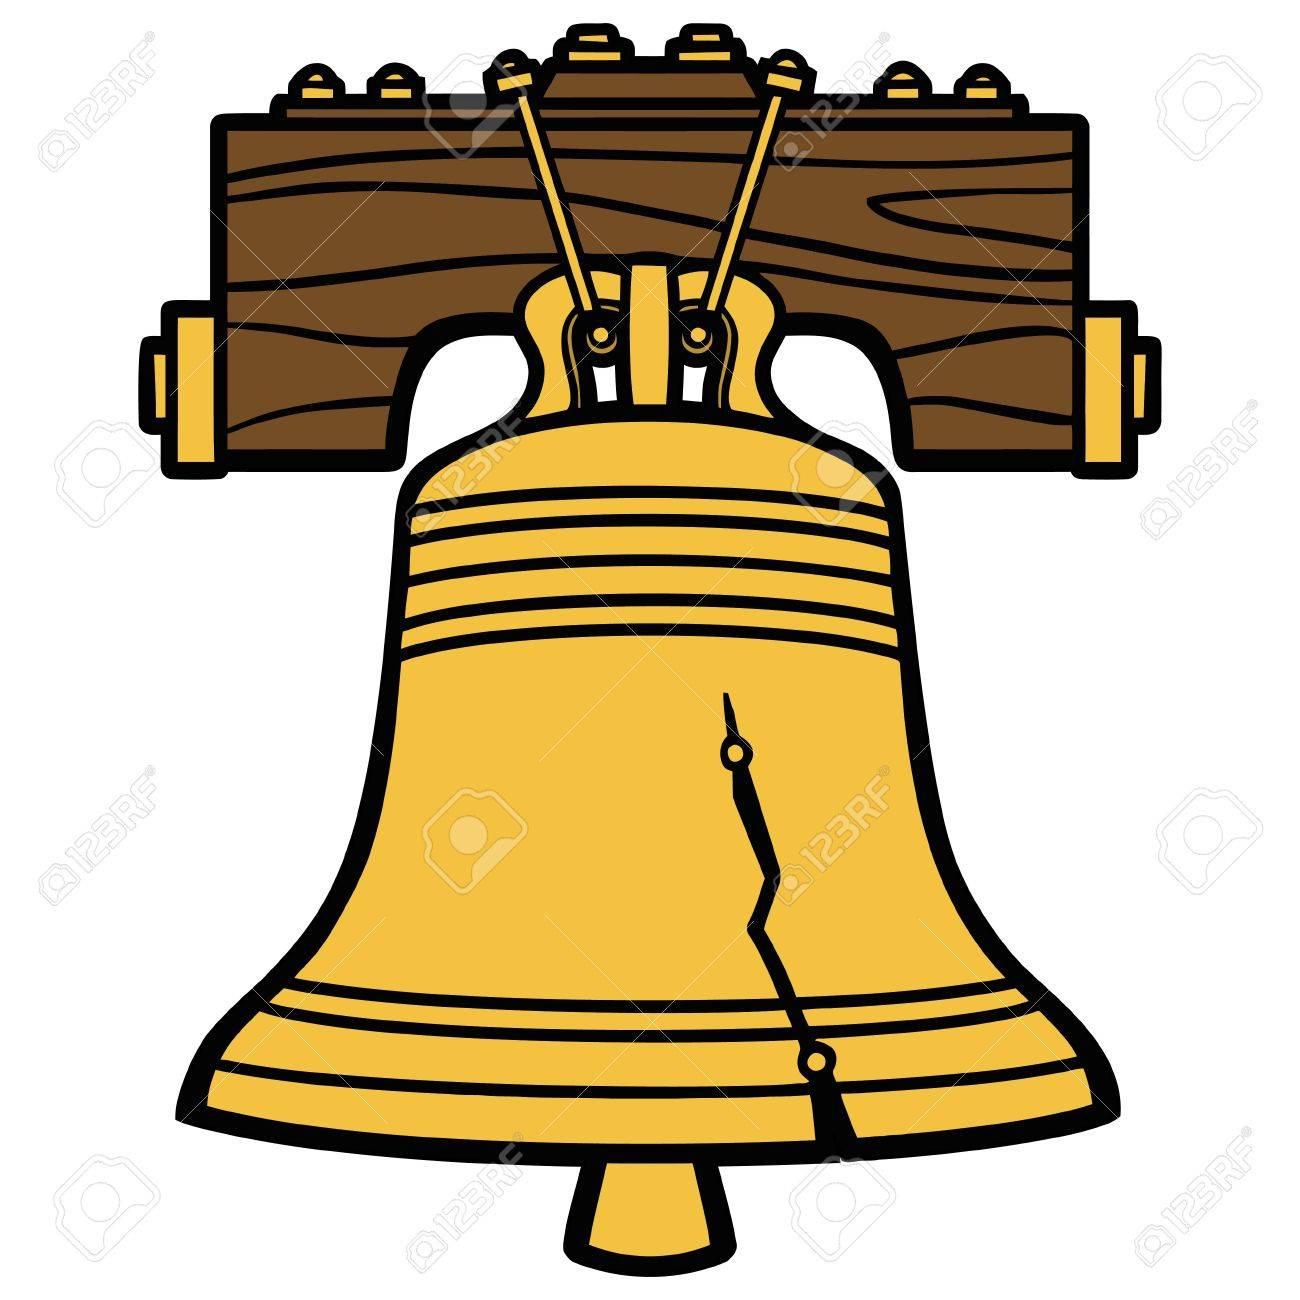 Liberty Bell - 57677973